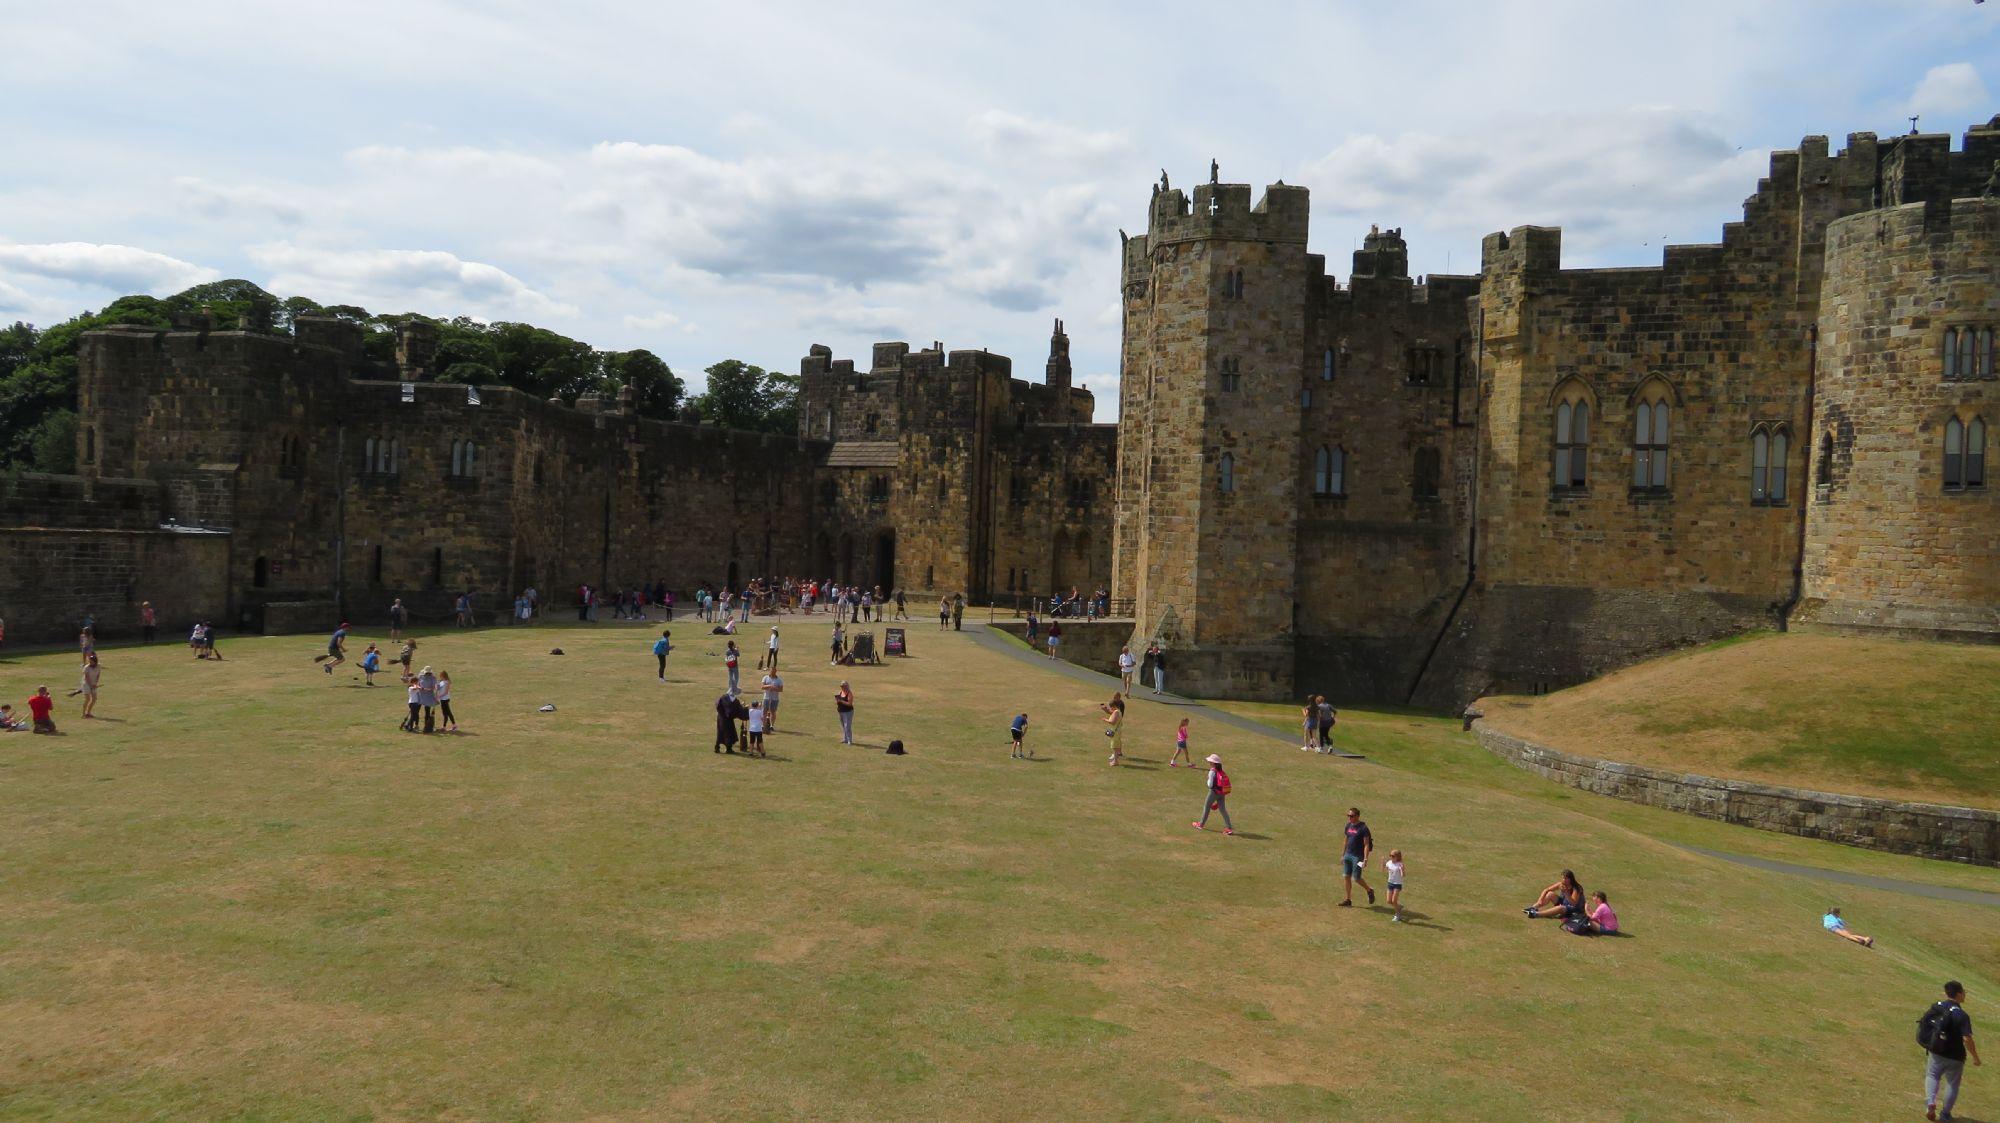 Inside the Castle ....